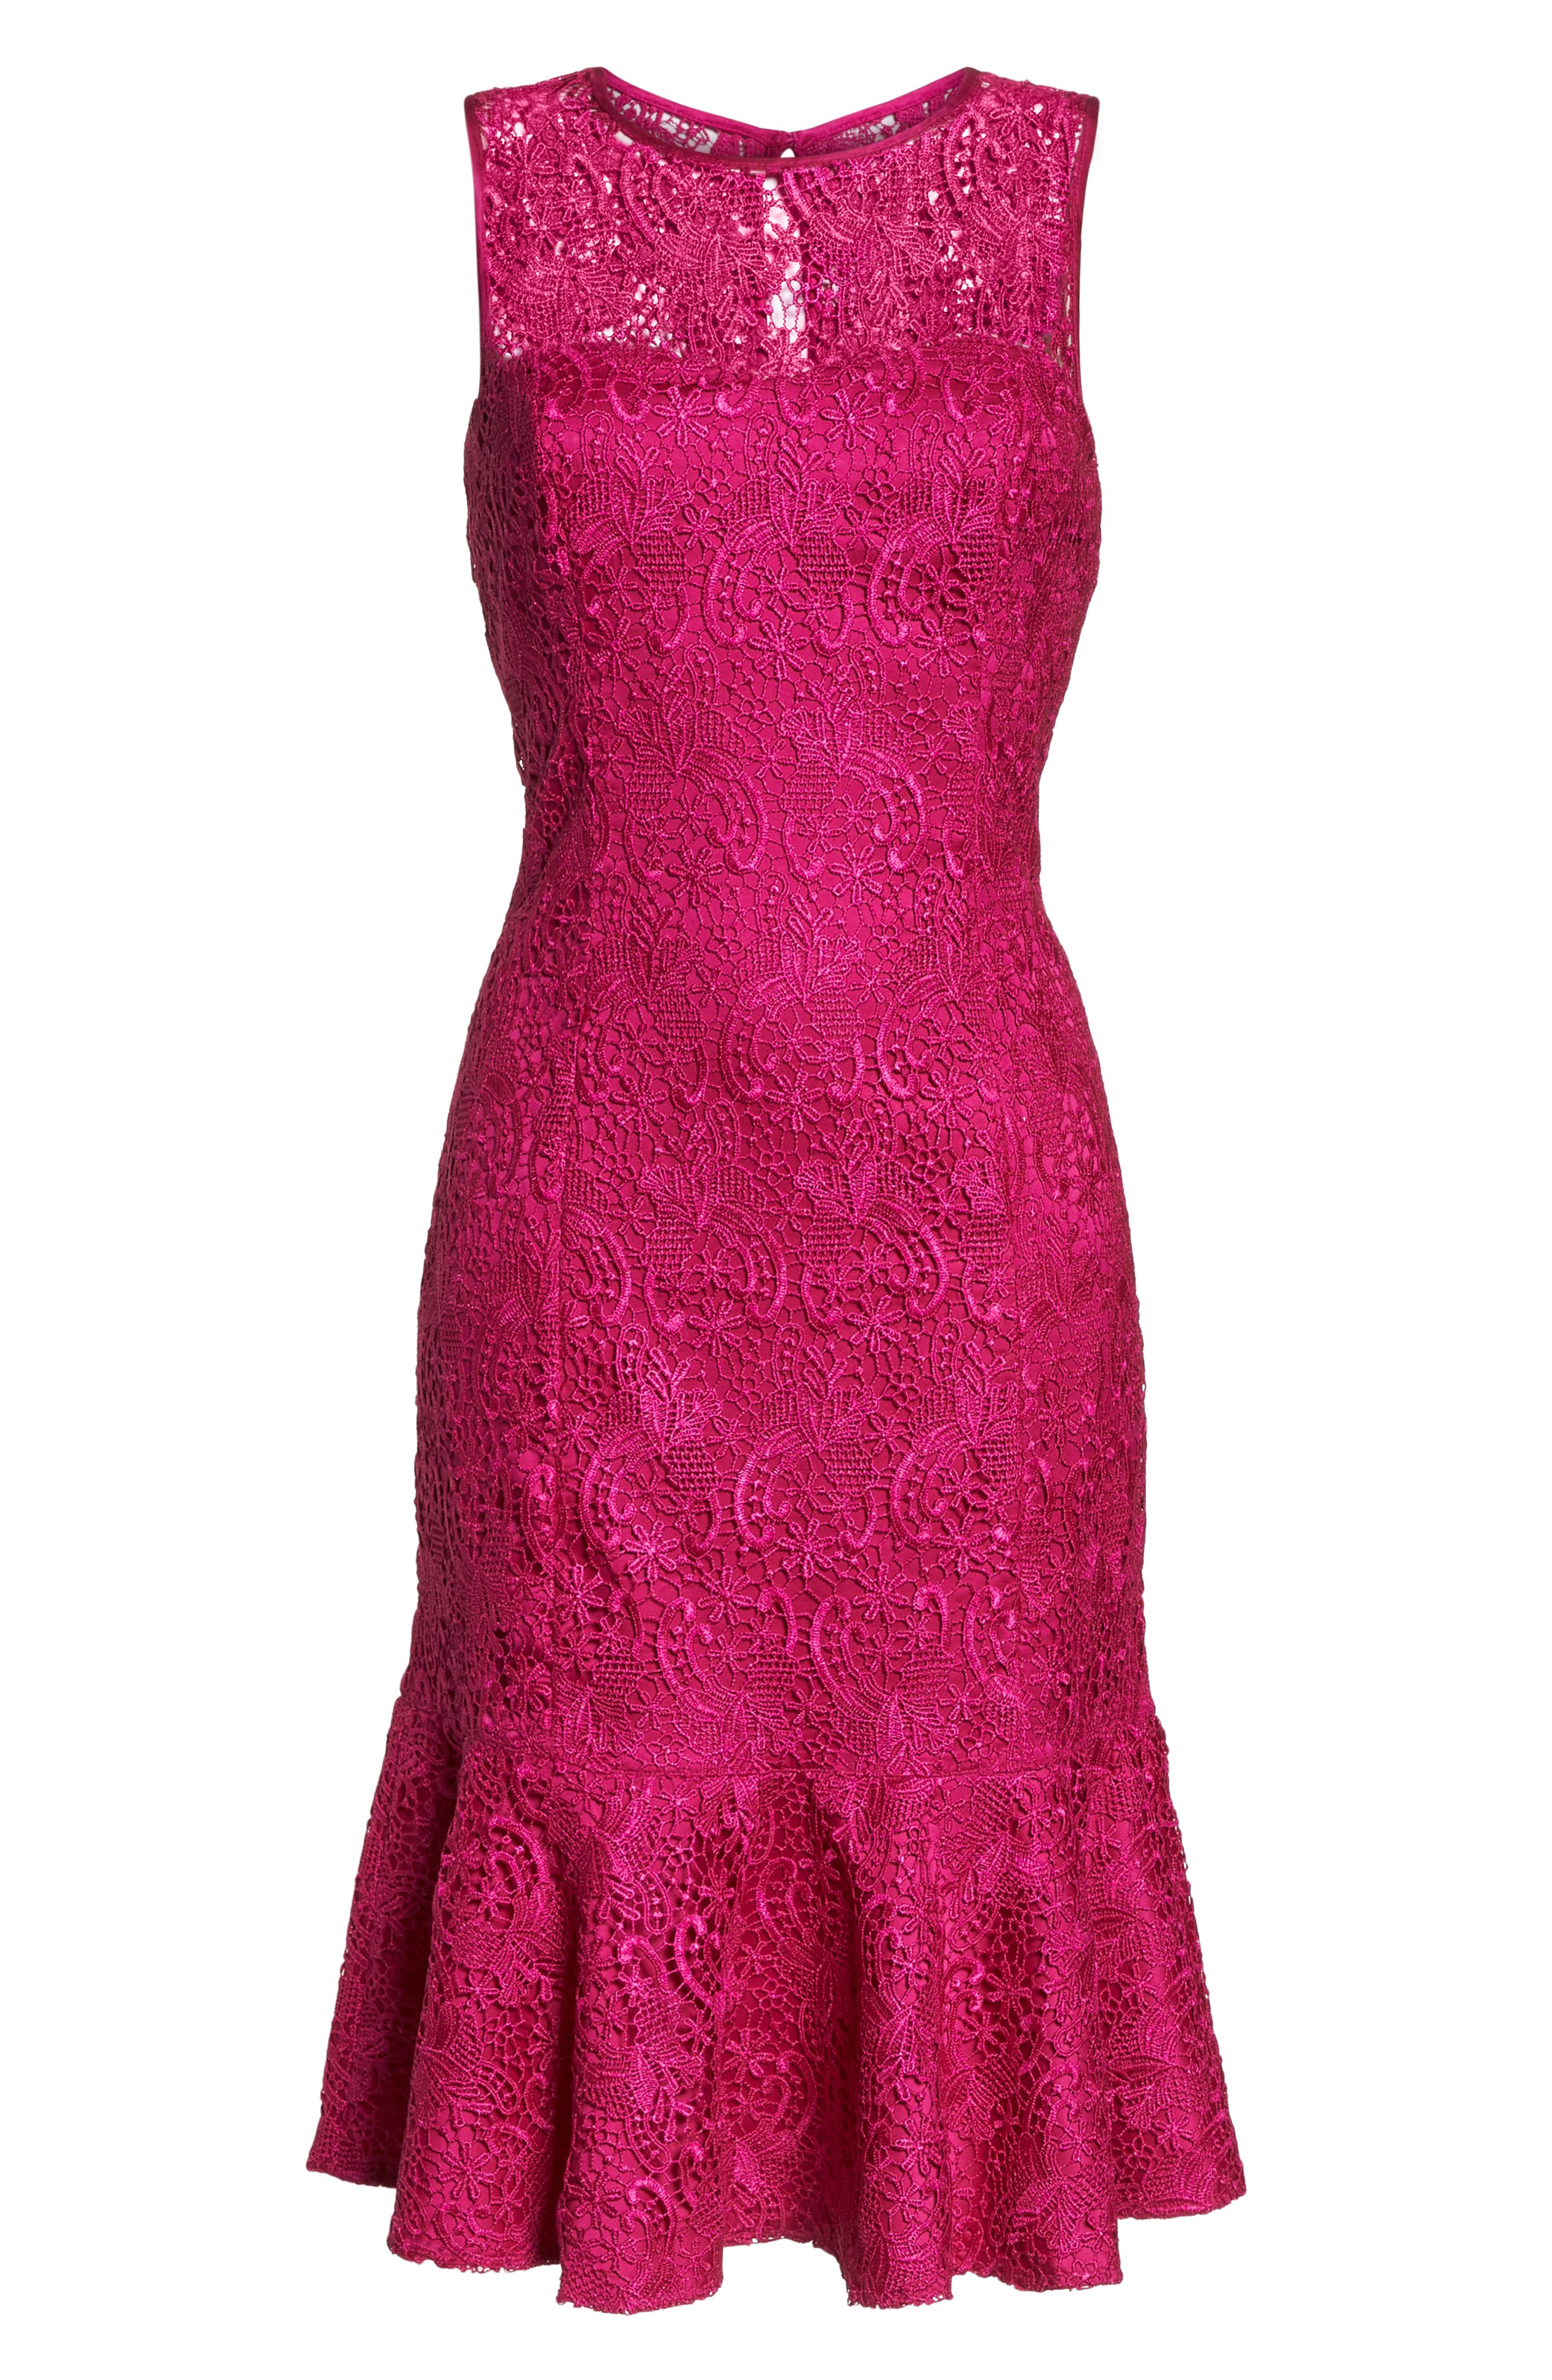 Sleeveless Lace Sheath Dress,                             Alternate thumbnail 7, color,                             660